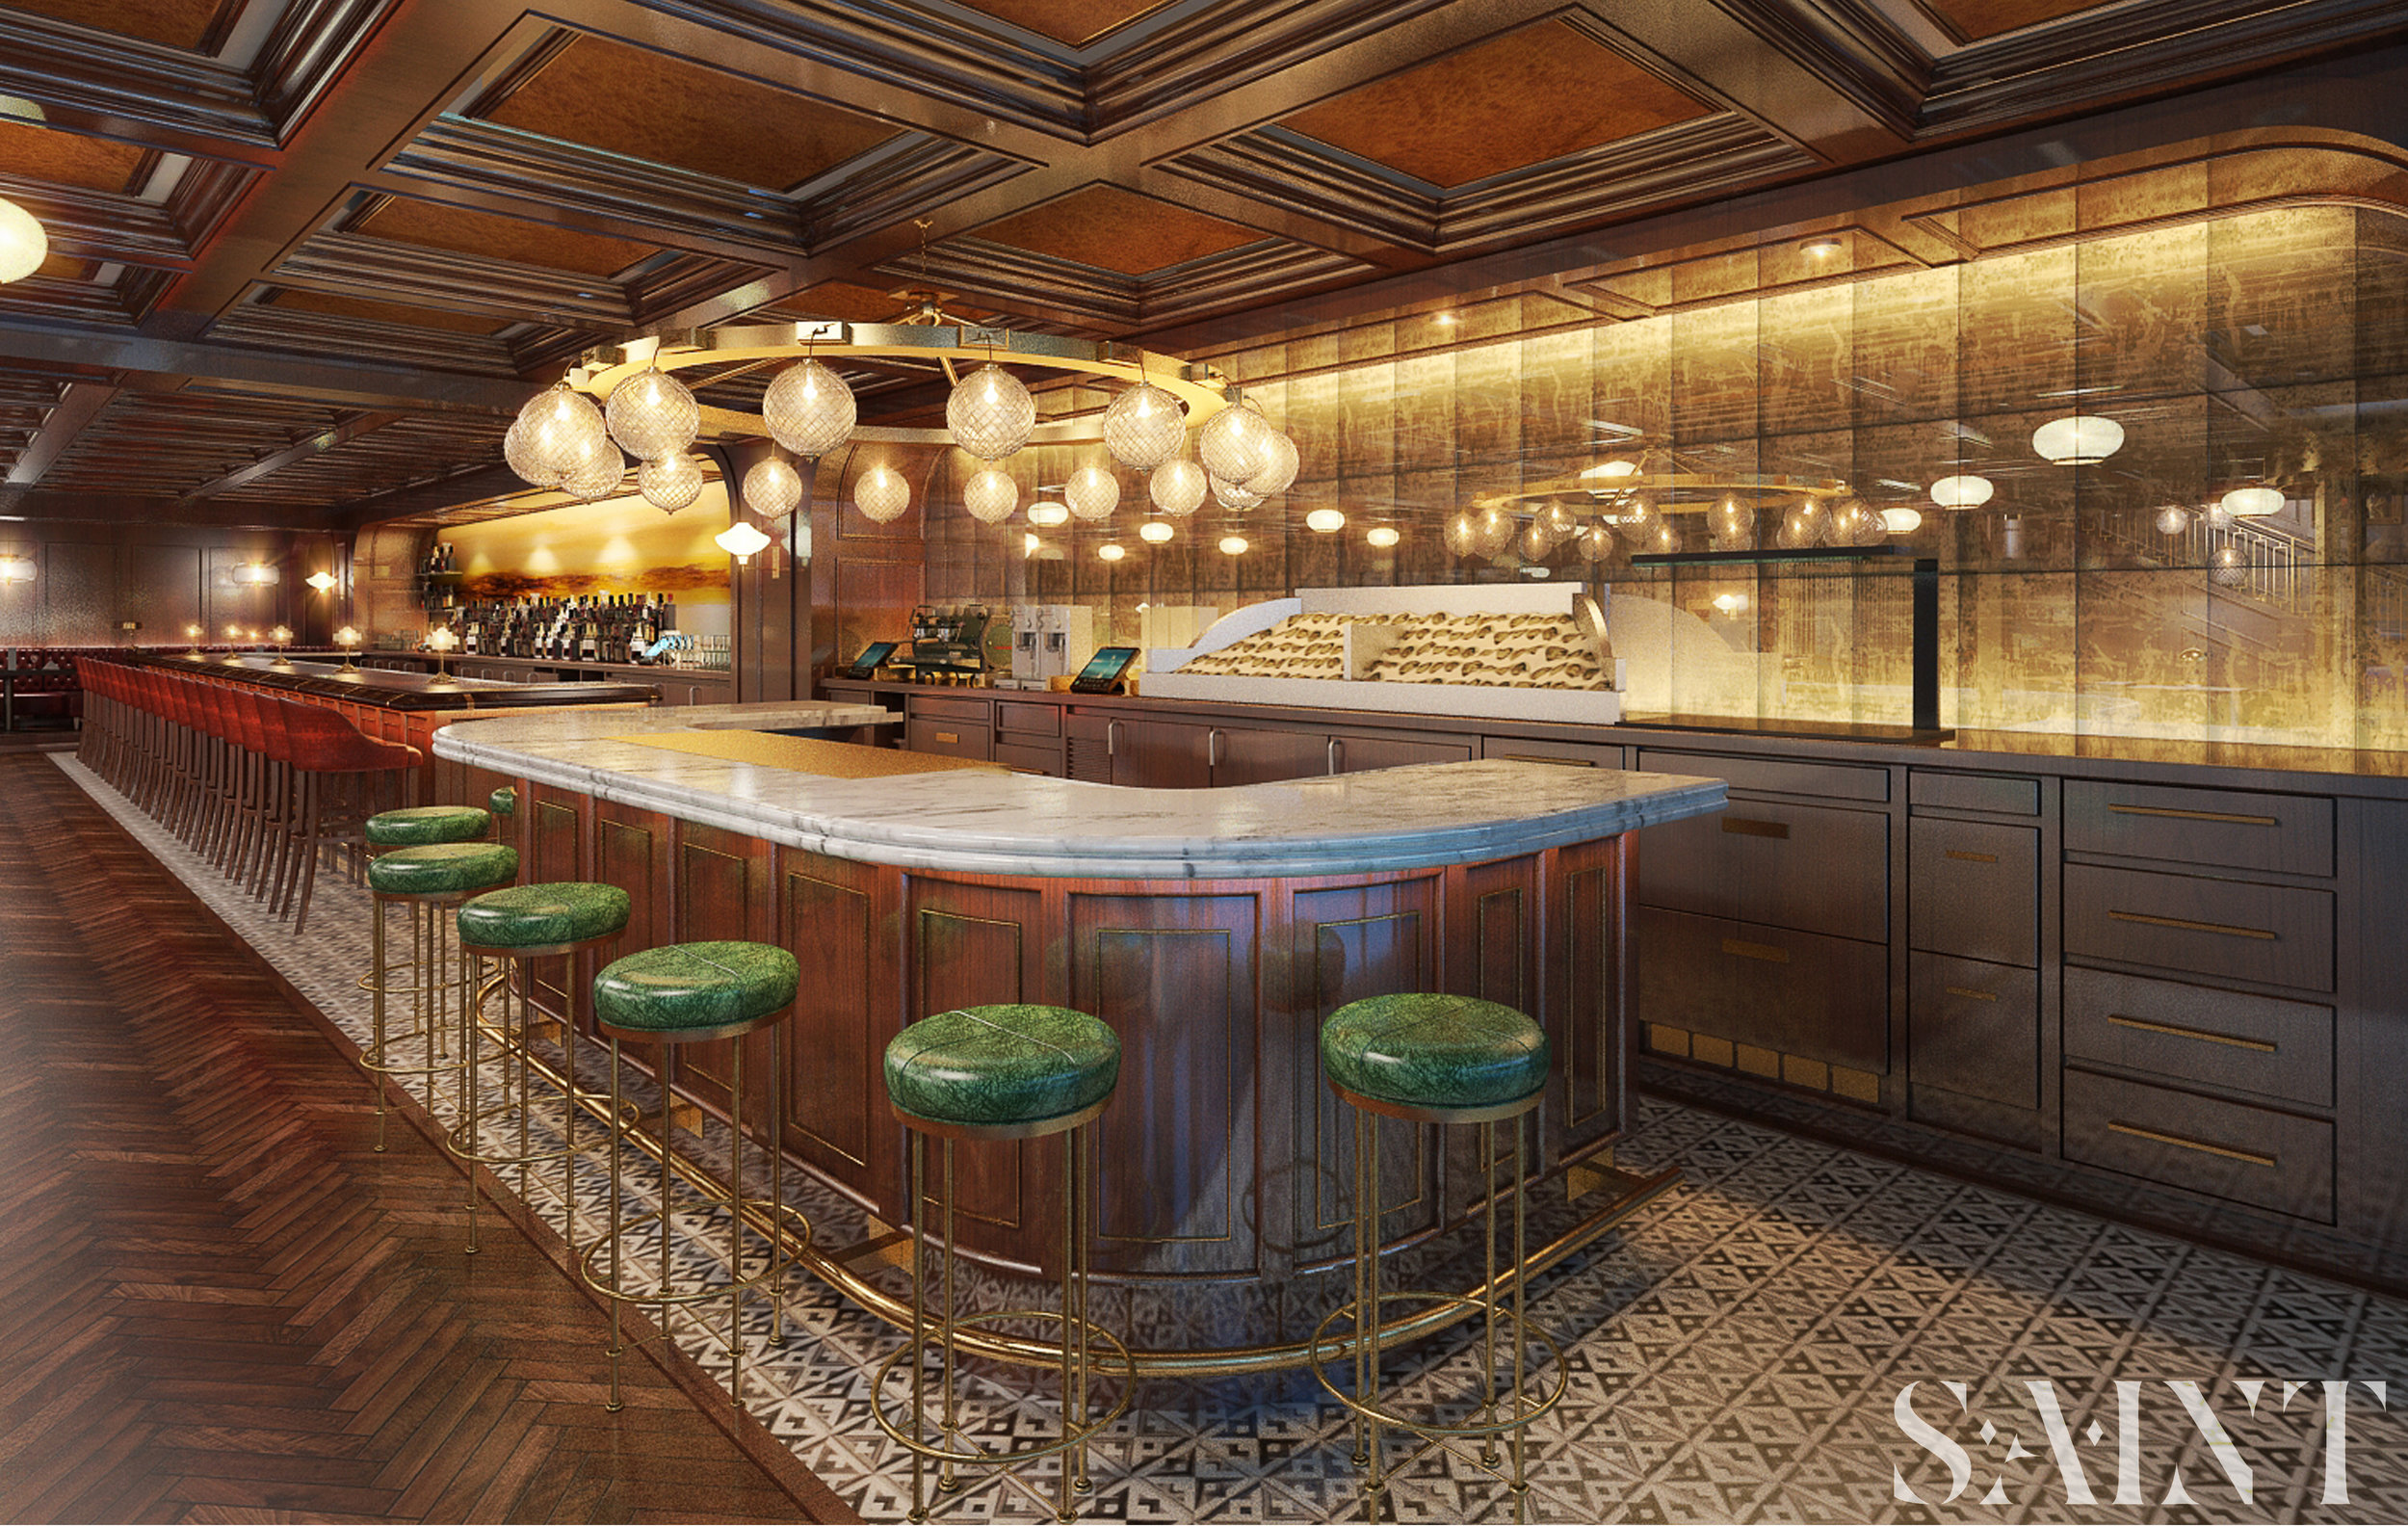 studio-saint-bars-and-restaurants-rare-steakhouse-washington-dc-rendering-2